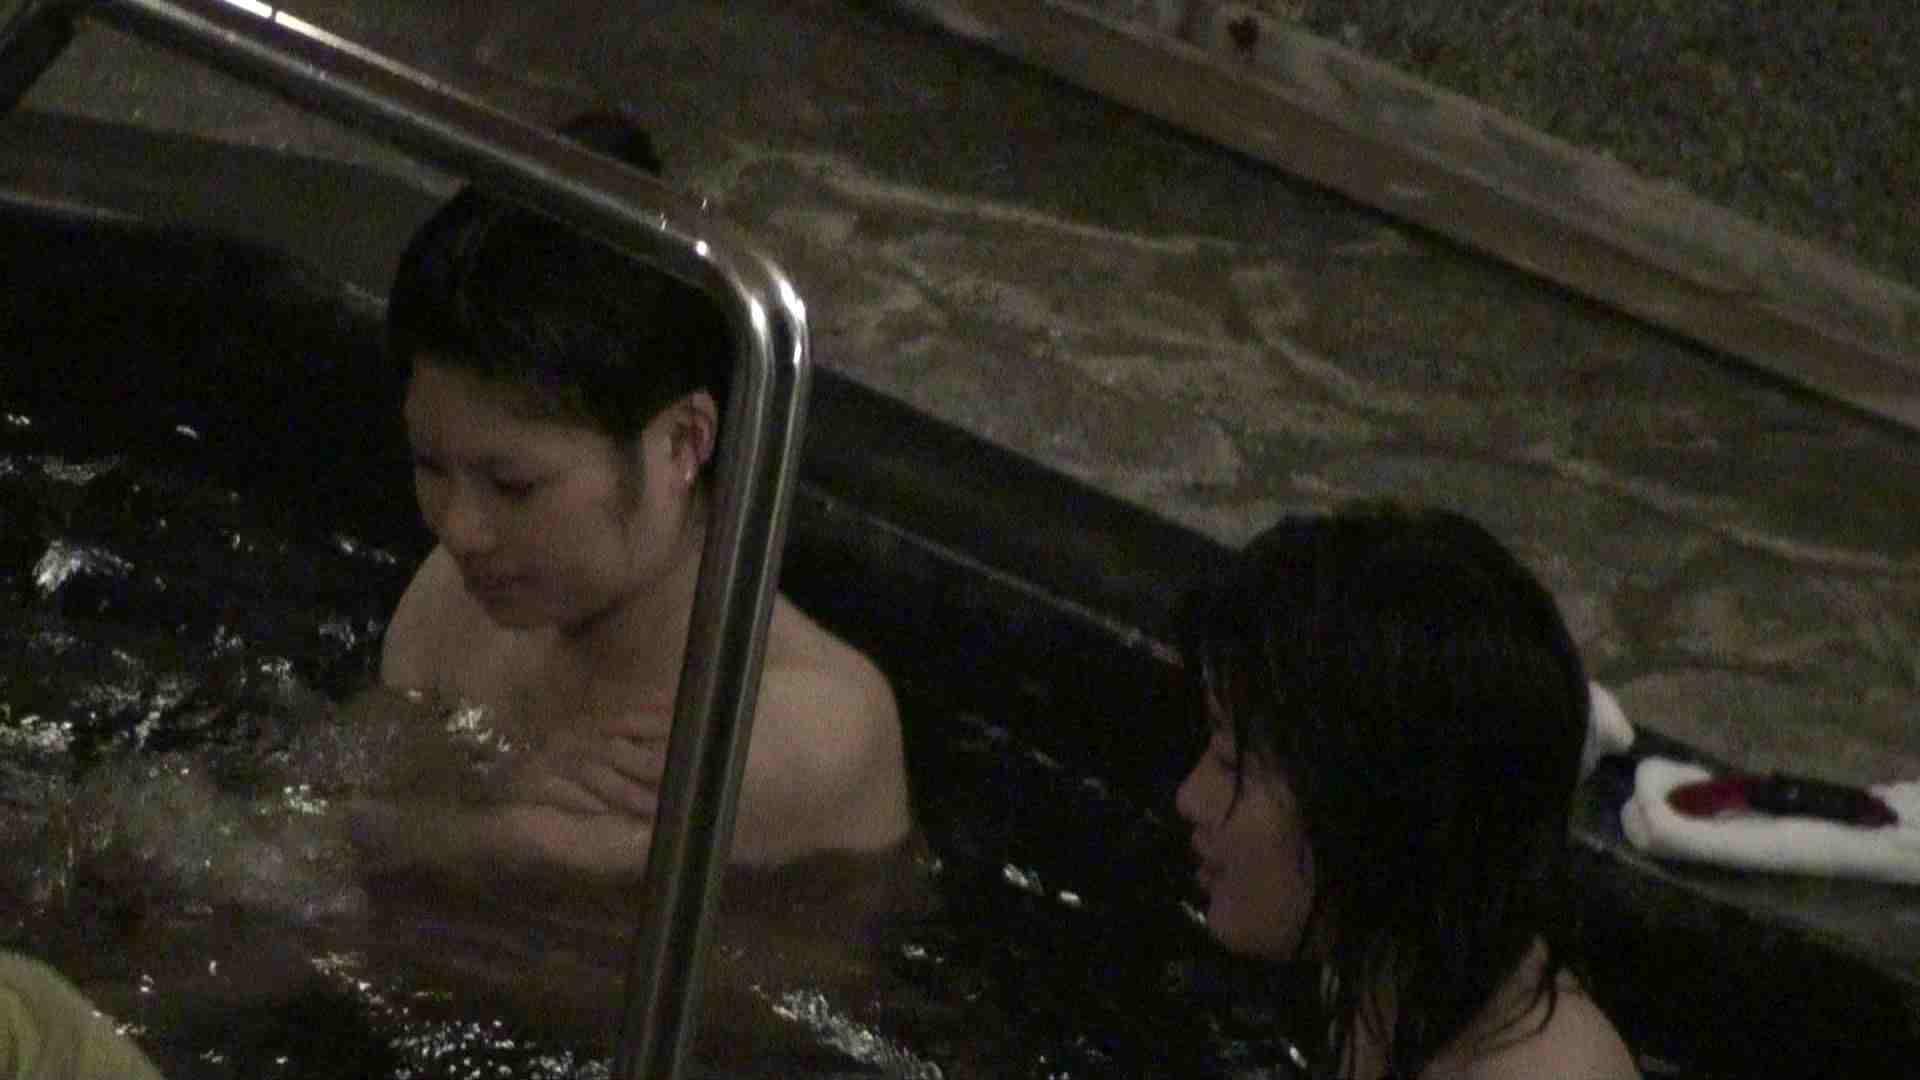 Aquaな露天風呂Vol.350 盗撮   HなOL  73pic 26